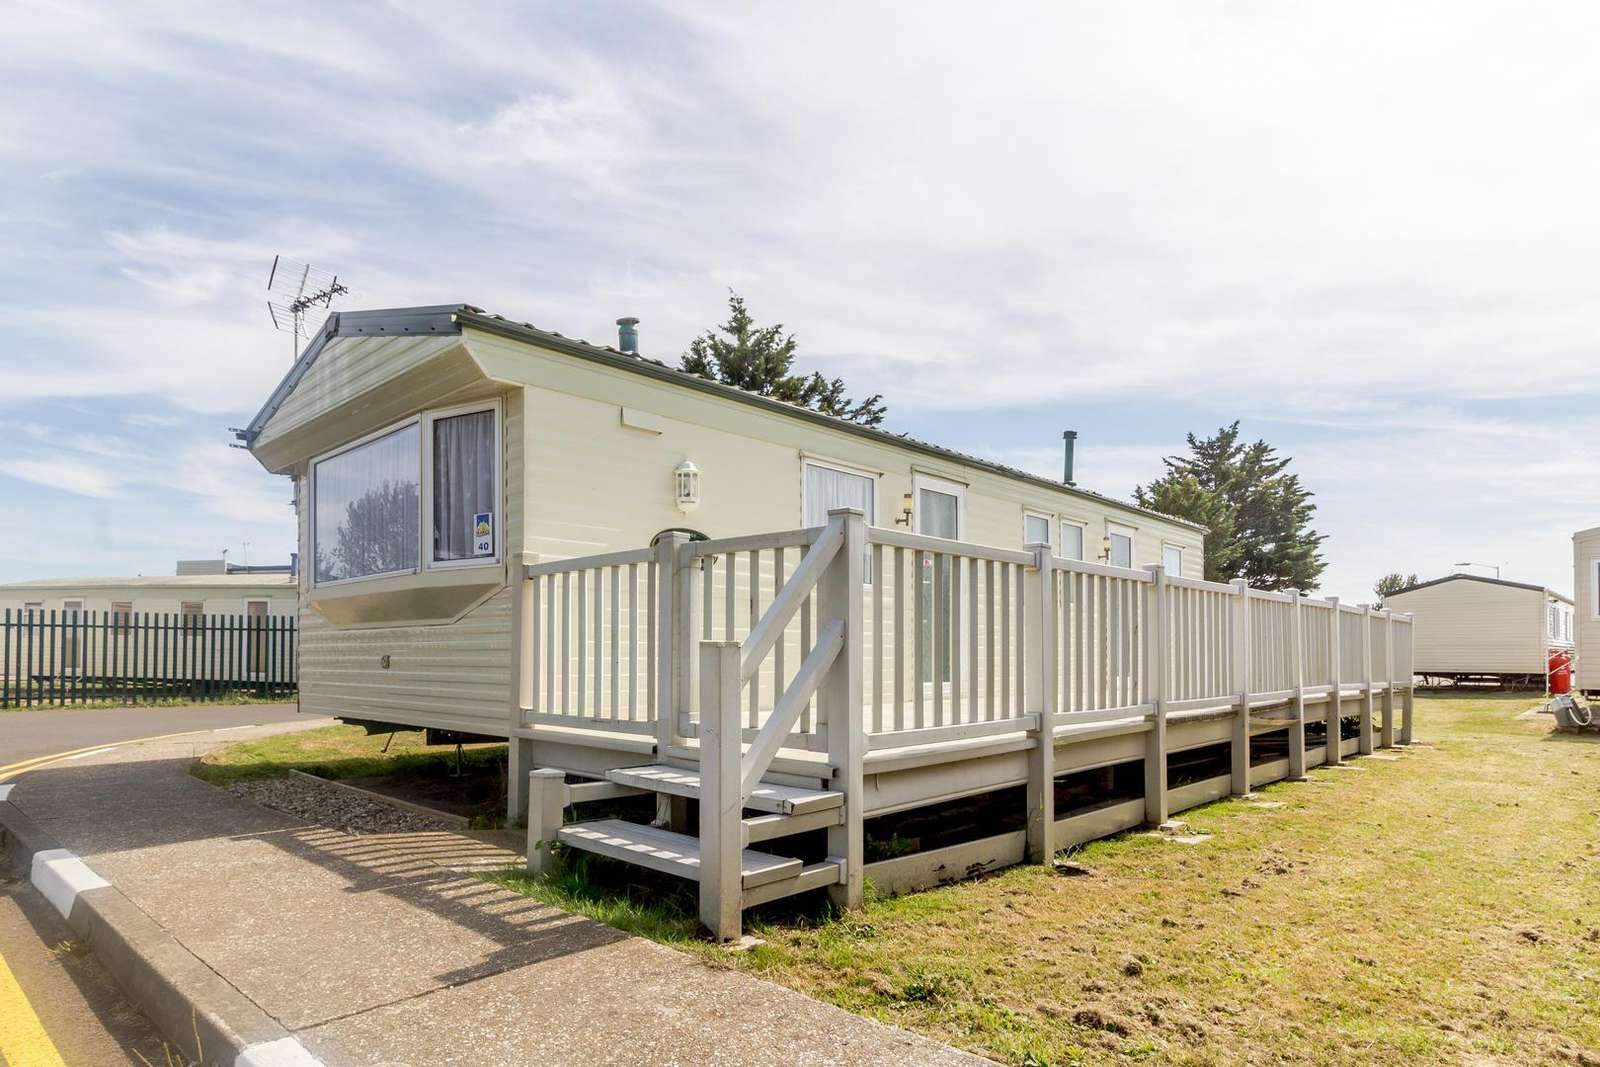 27040S – Seawick, 3 bed, 8 berth caravan close to amenities. Ruby rated. - property